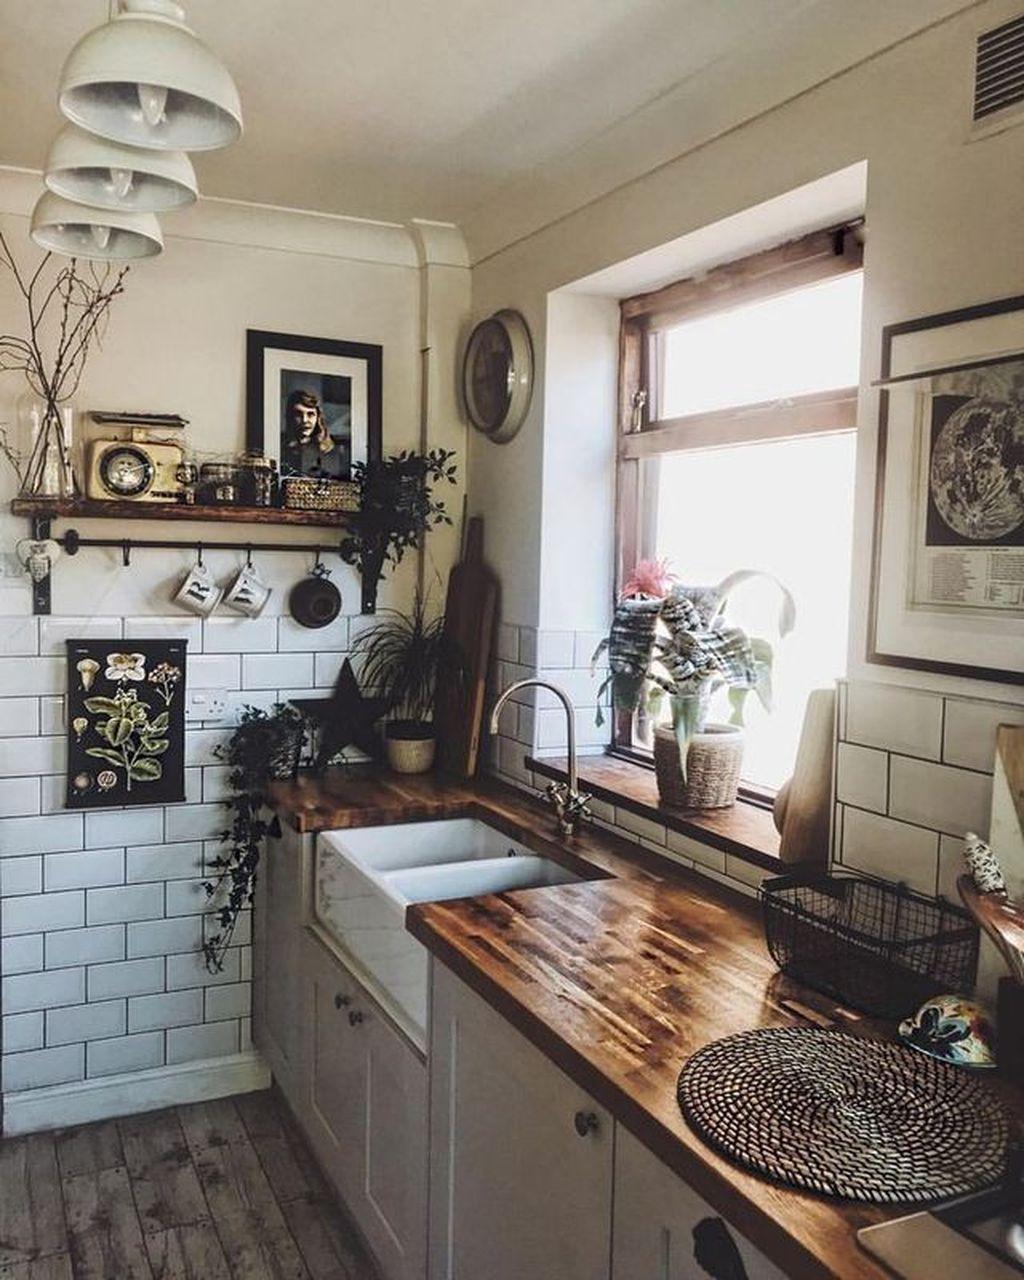 42 Extraordinary Home Decor Ideas You Should Already Own Rustic Kitchen Rustic Kitchen Decor Kitchen Accessories Decor